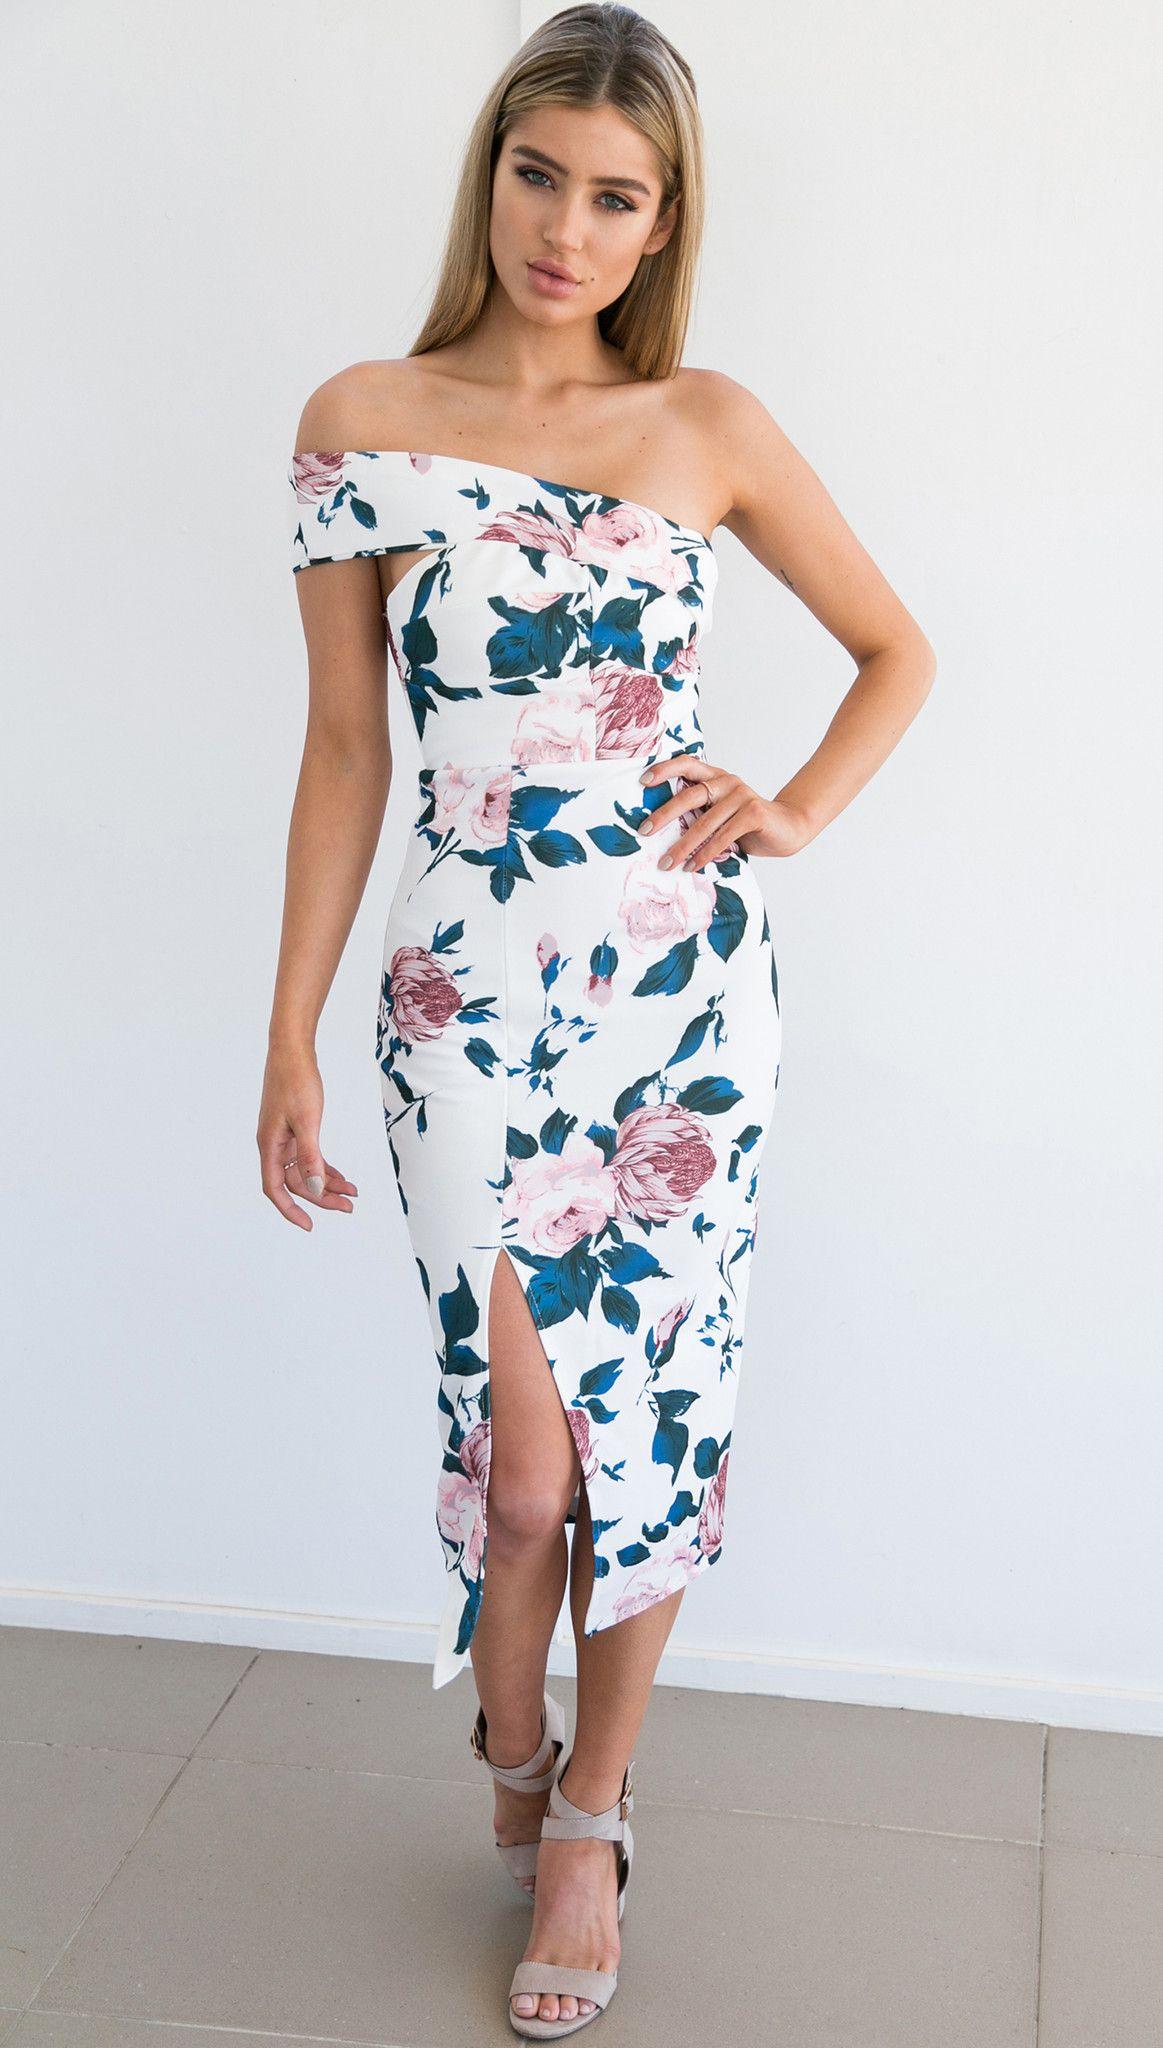 Cartwright Dress (White) Online fashion boutique